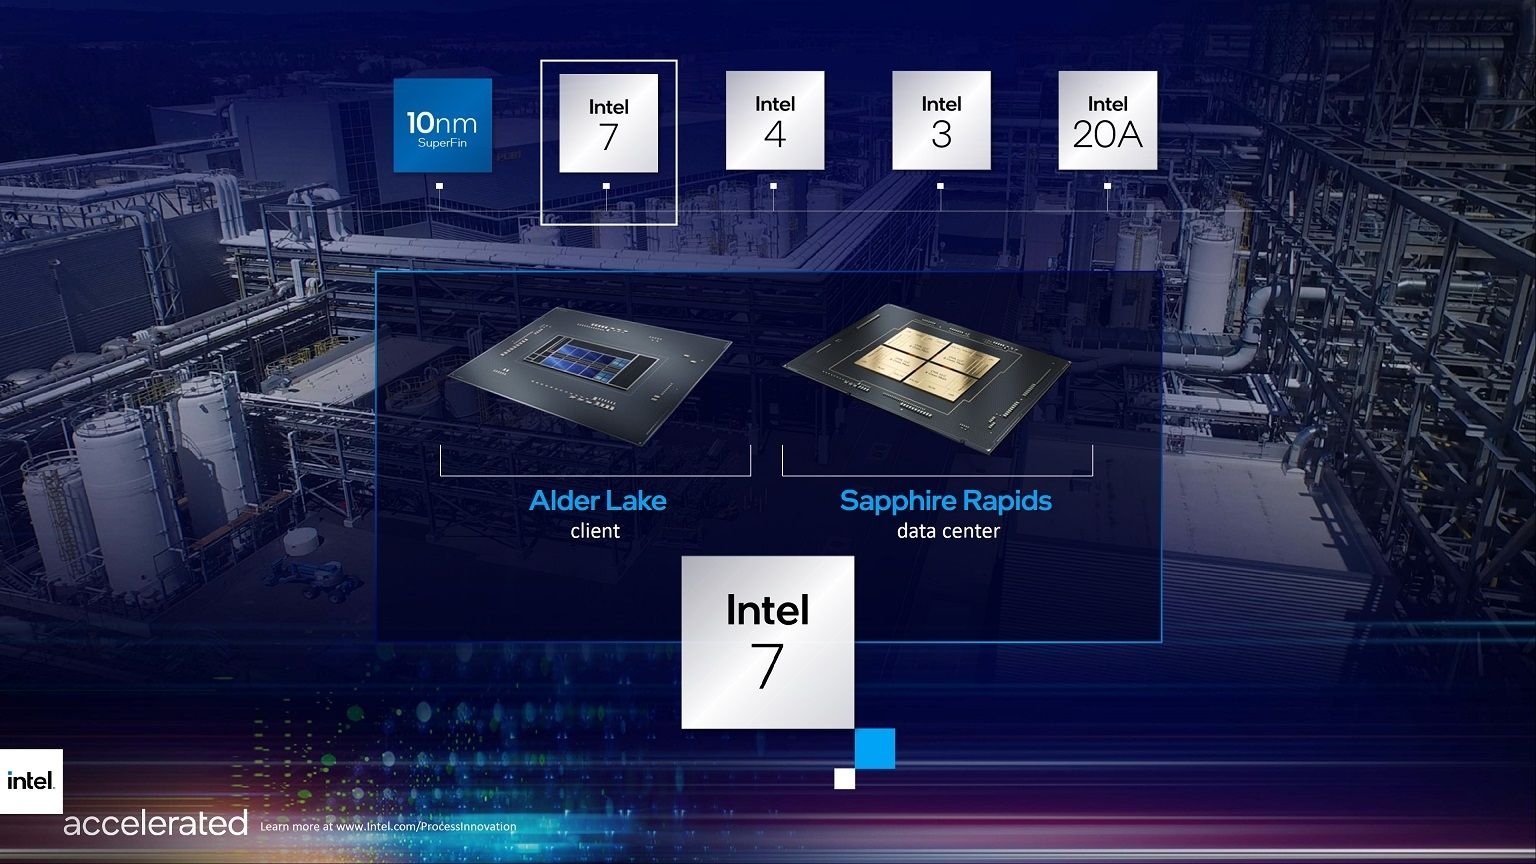 Intel 7 Alder Lake Sapphire Rapids